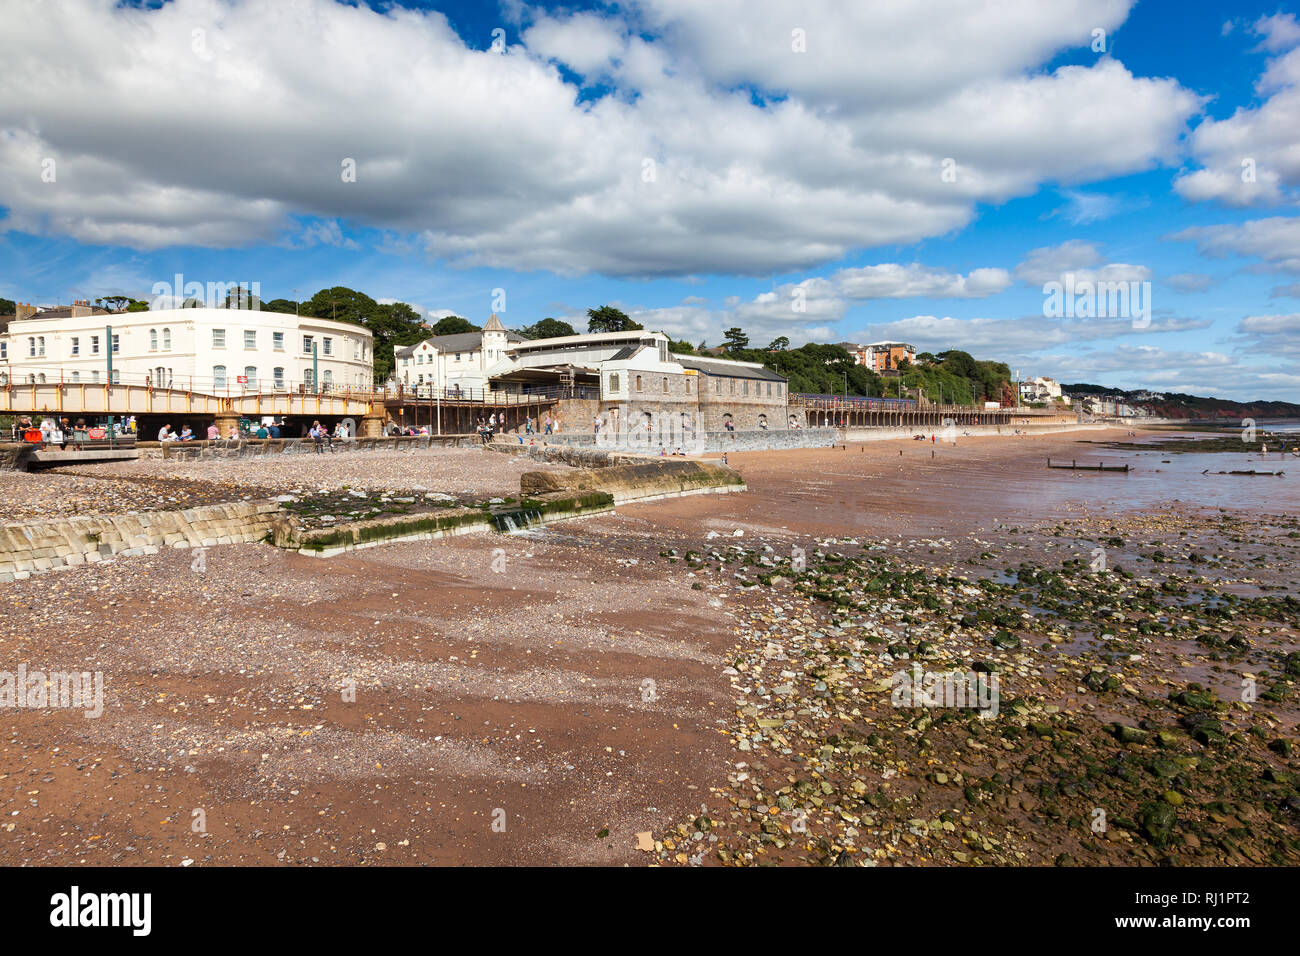 Summer overlooking the beach at Dawlish Devon England UK Europe - Stock Image